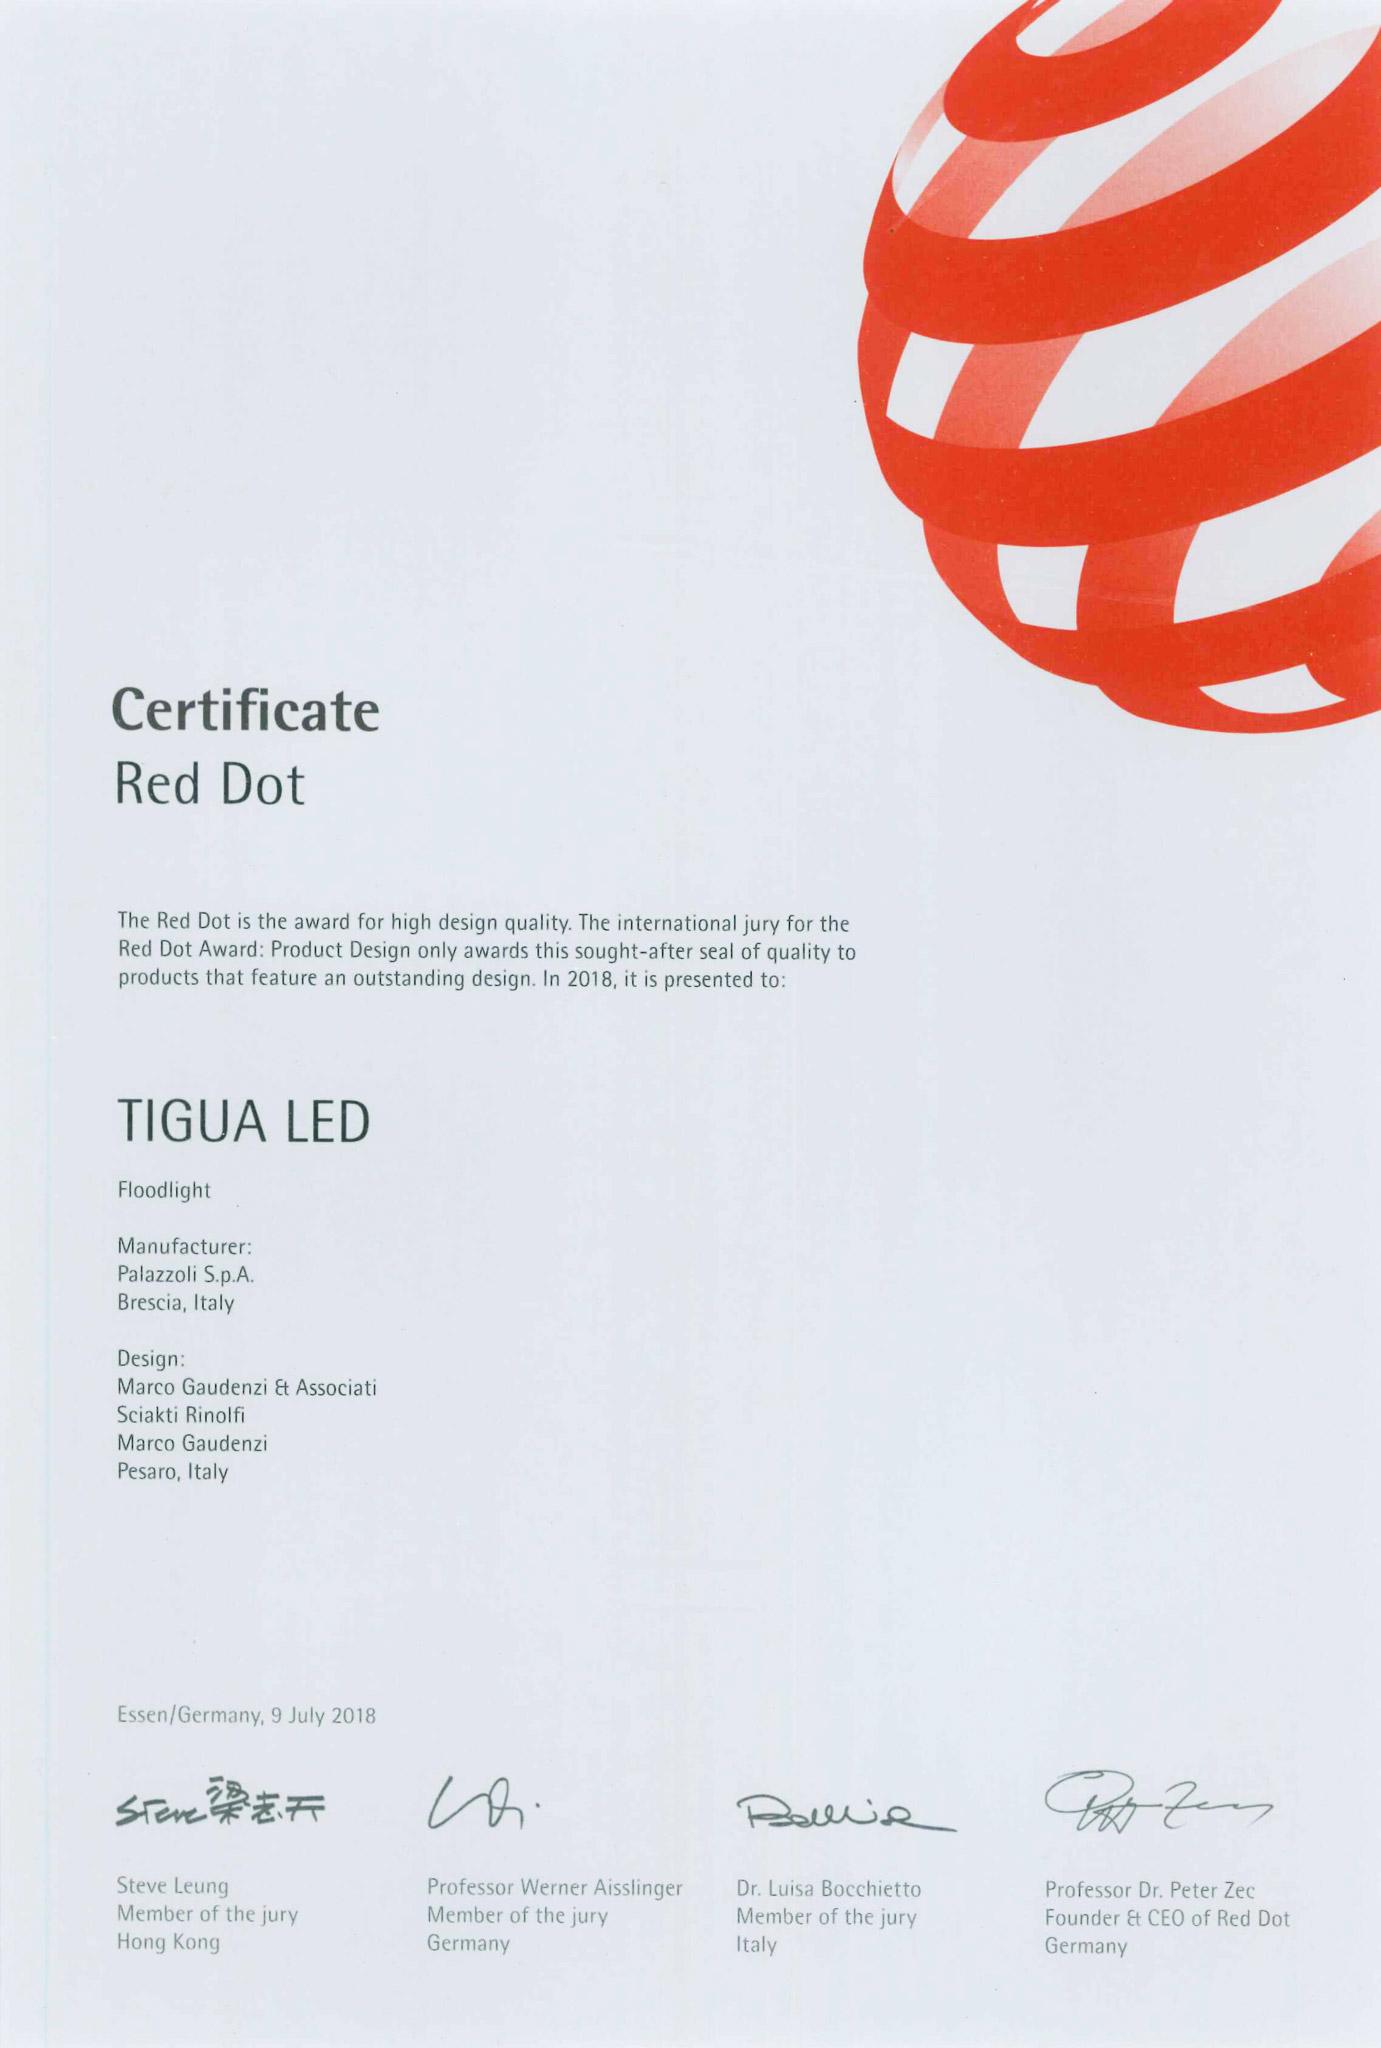 Red Dot Tigua